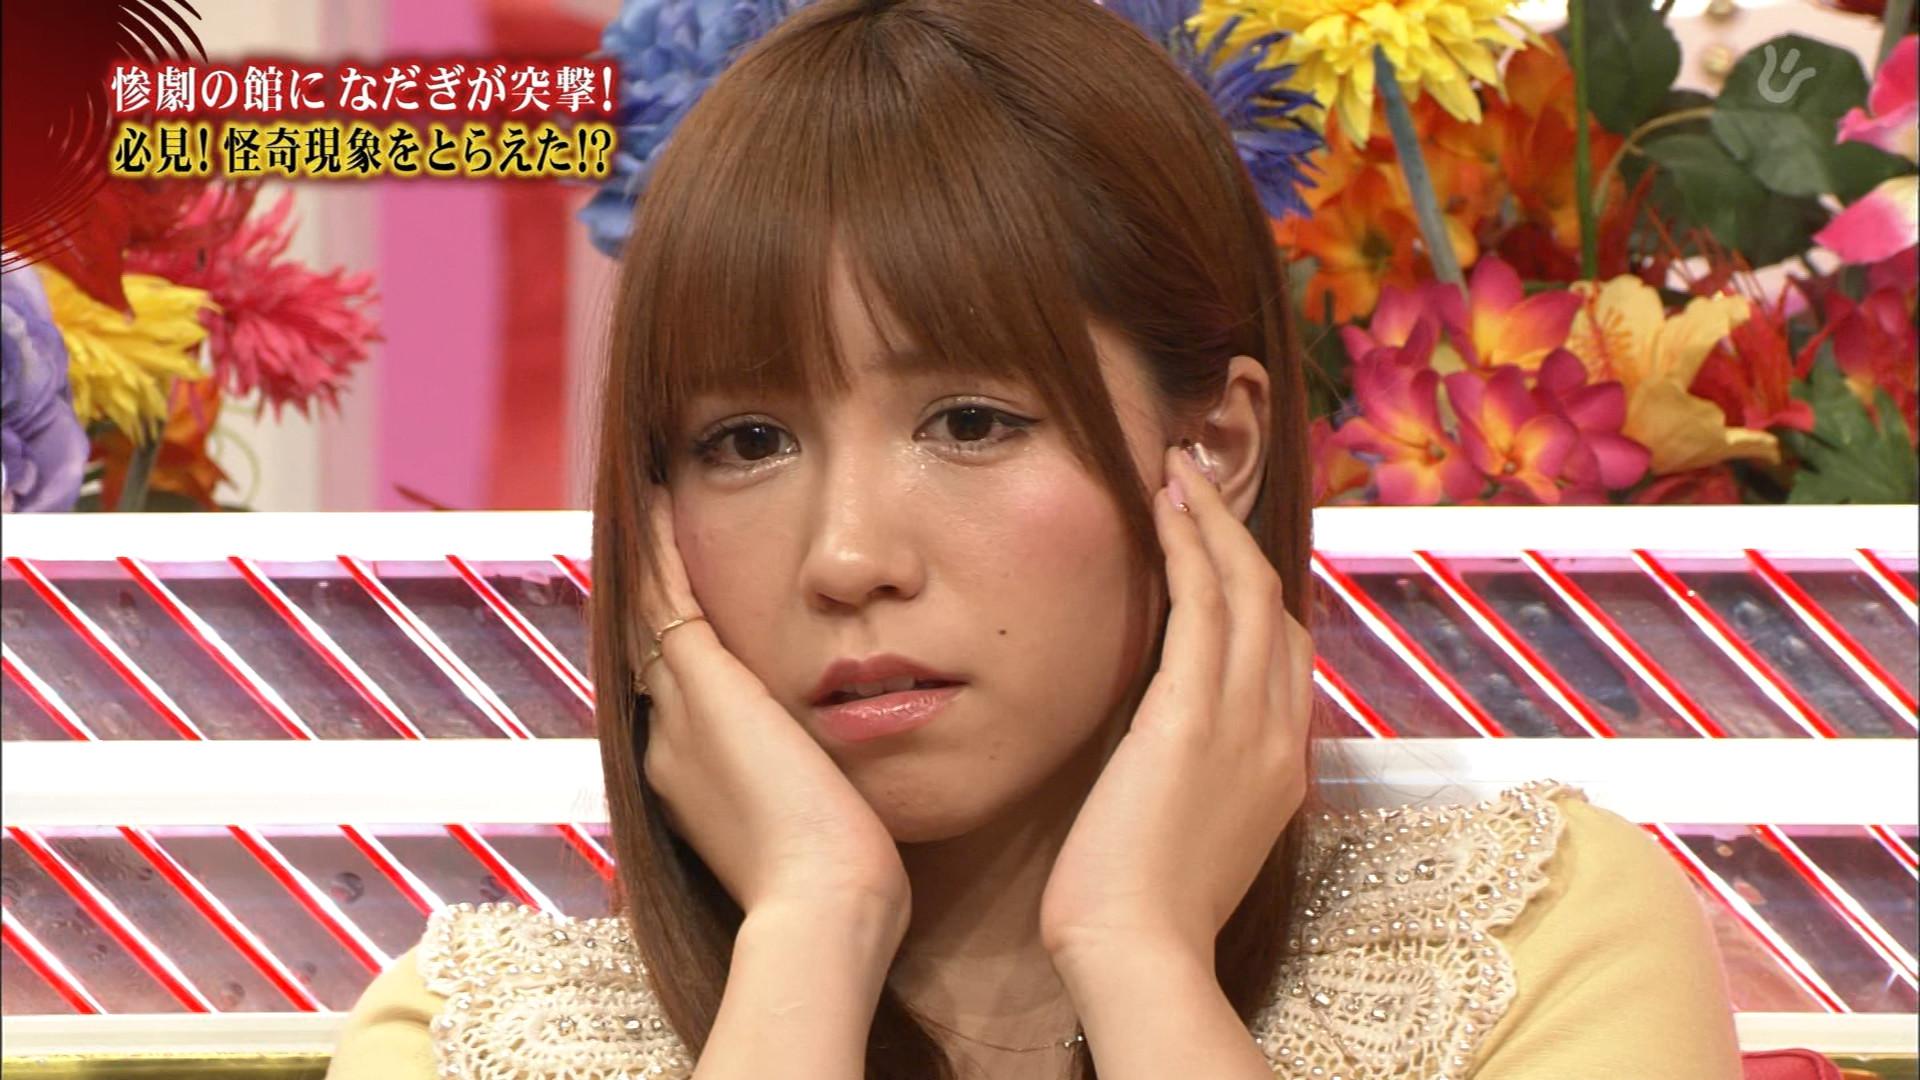 AKB48 河西智美 セクシー 顔アップ 怖がり 怯え キャプチャー 高画質 エロかわいい画像